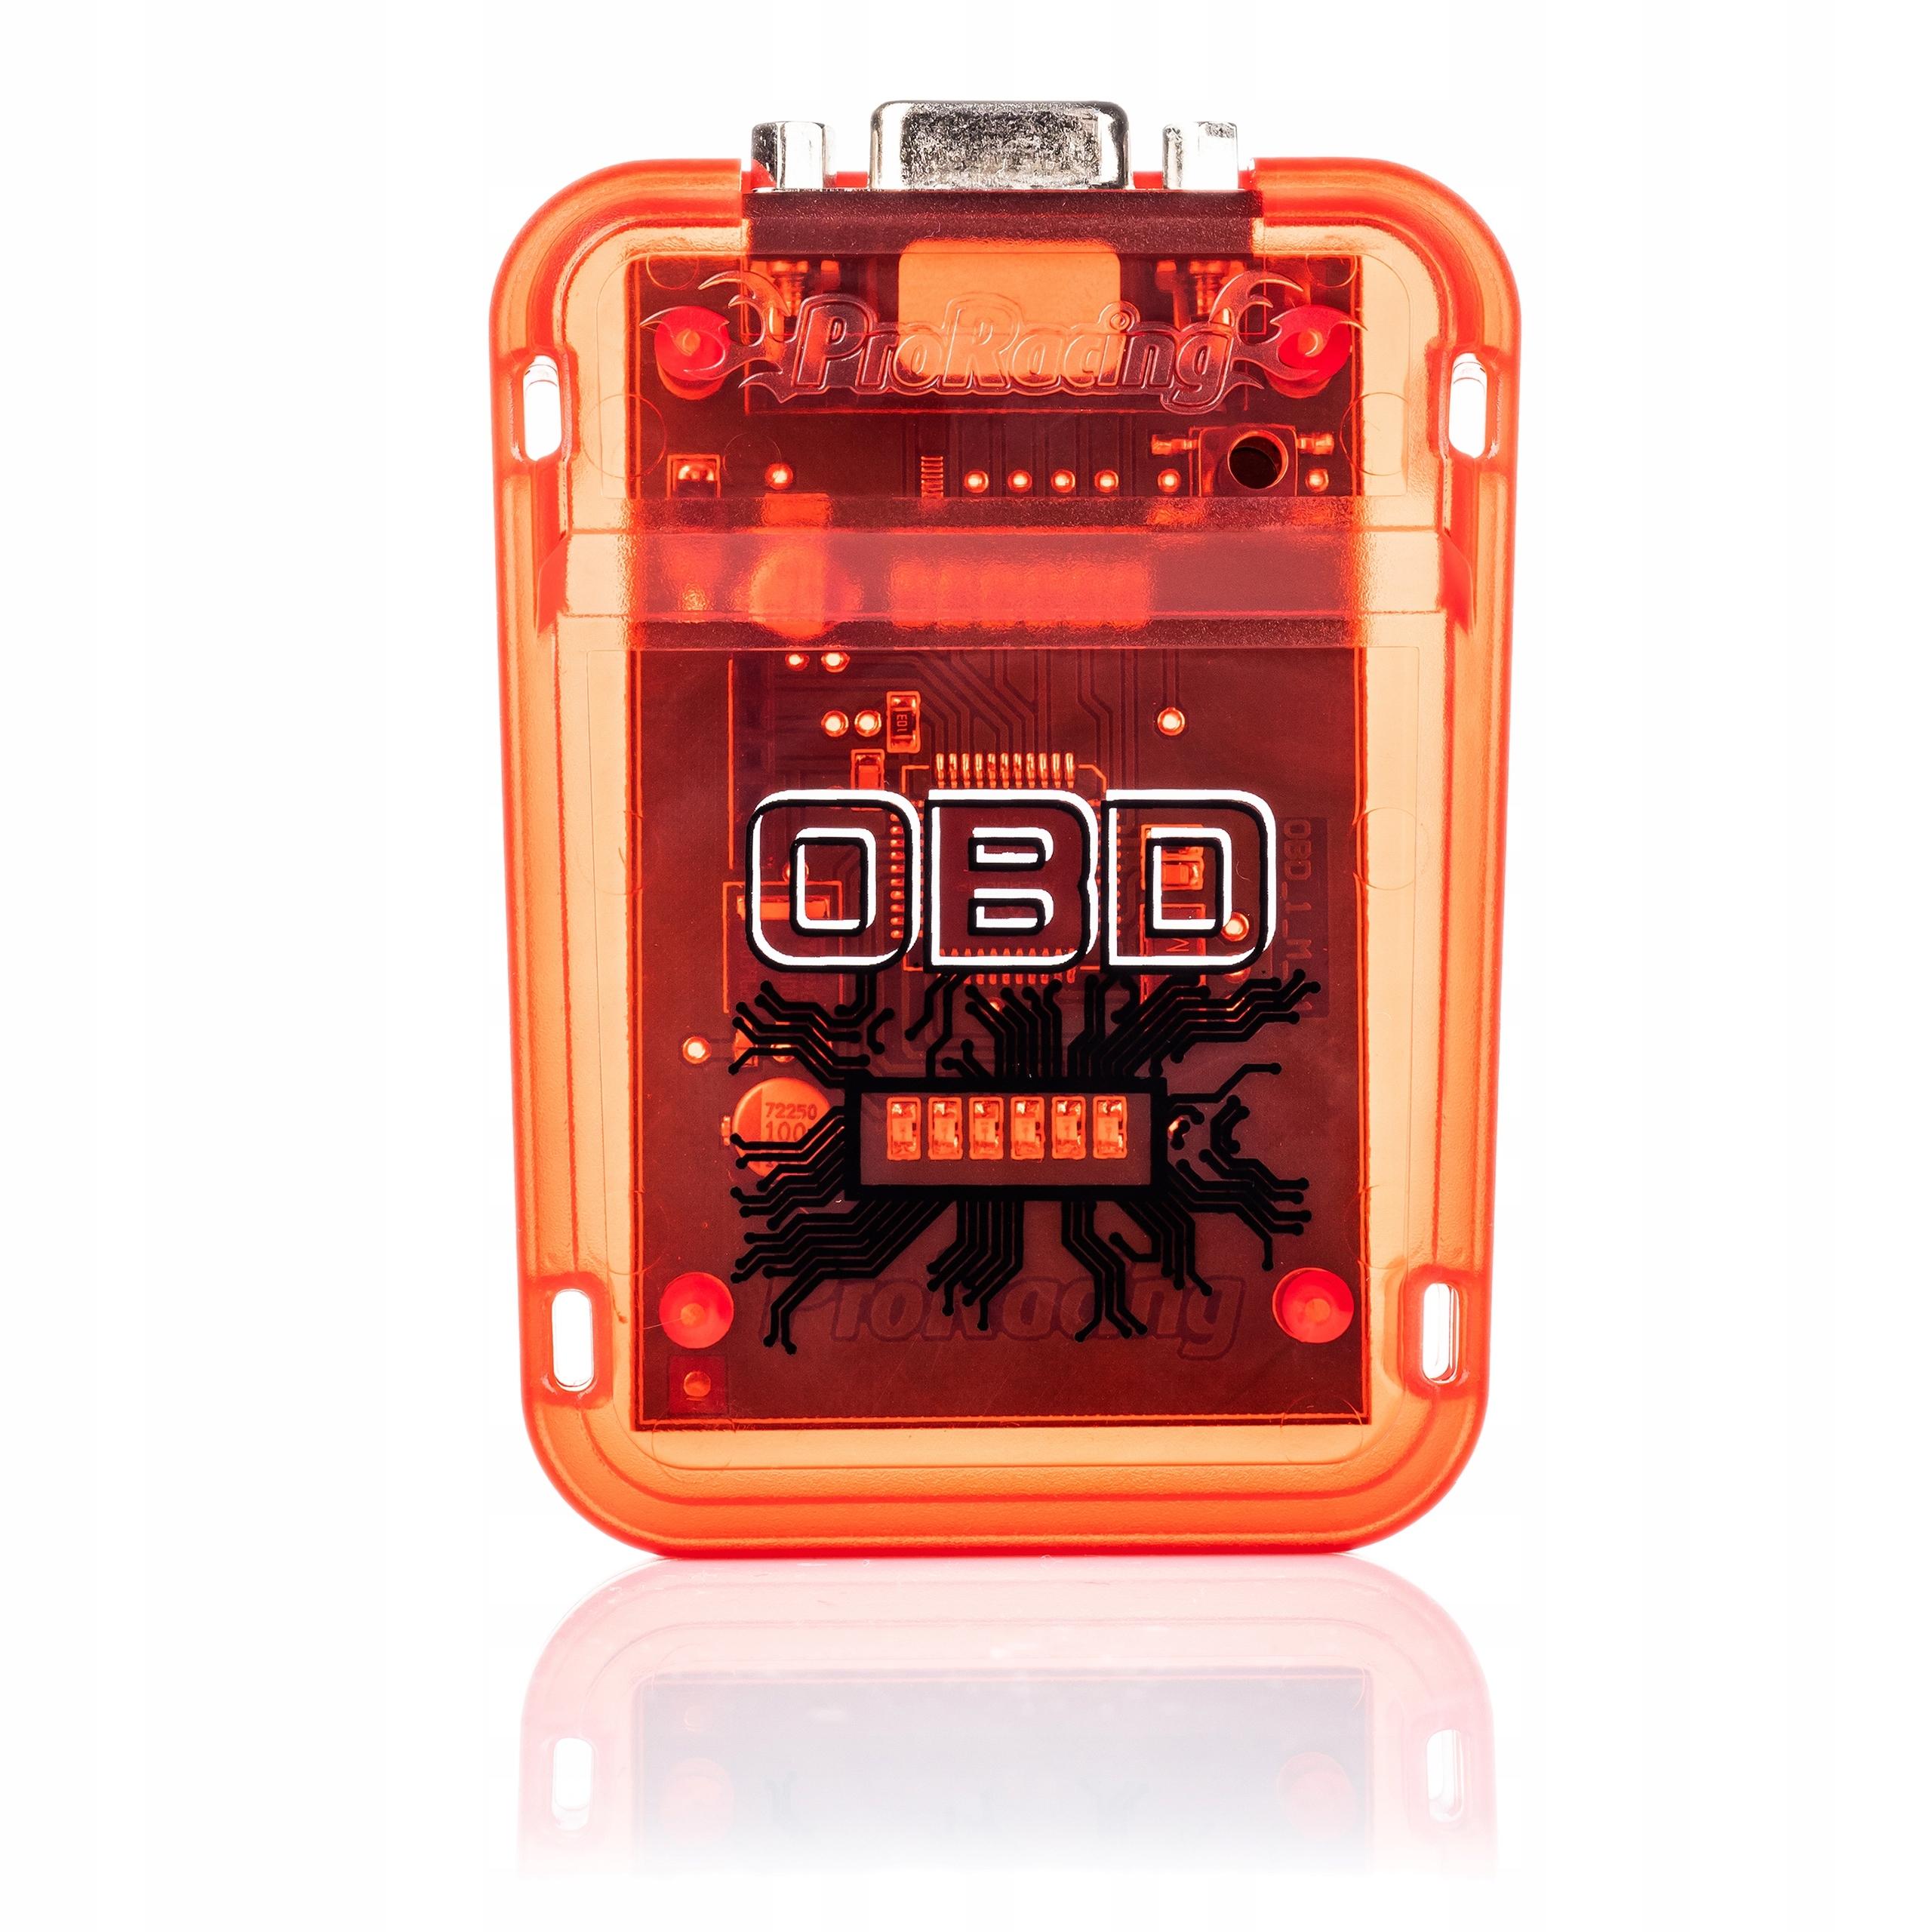 чип цифровой obd2 к тюнинг автомобиля тюнинг box